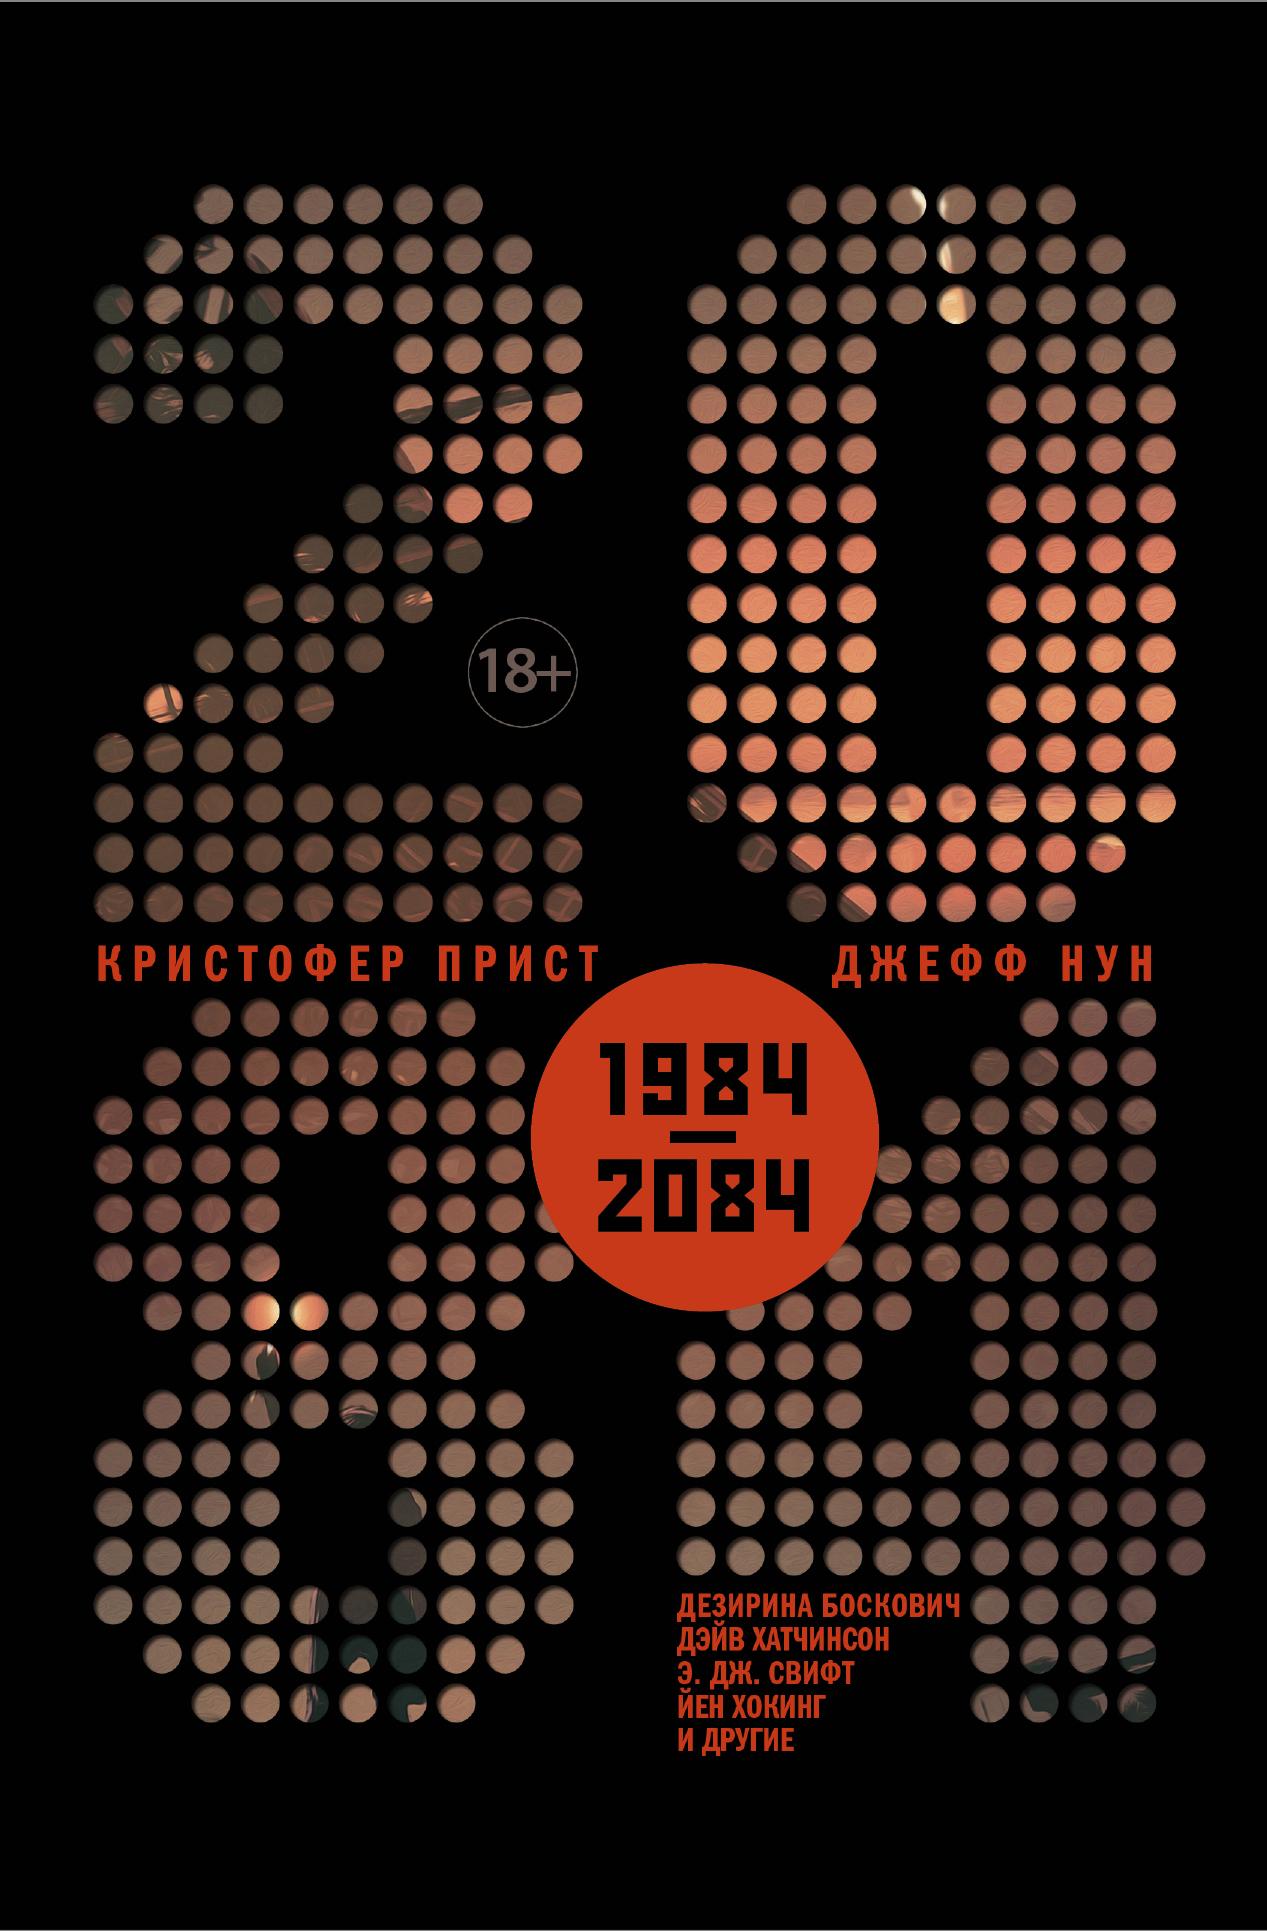 Прист Кристофер, Нун Джефф, Хатчинсон Дэйв 2084